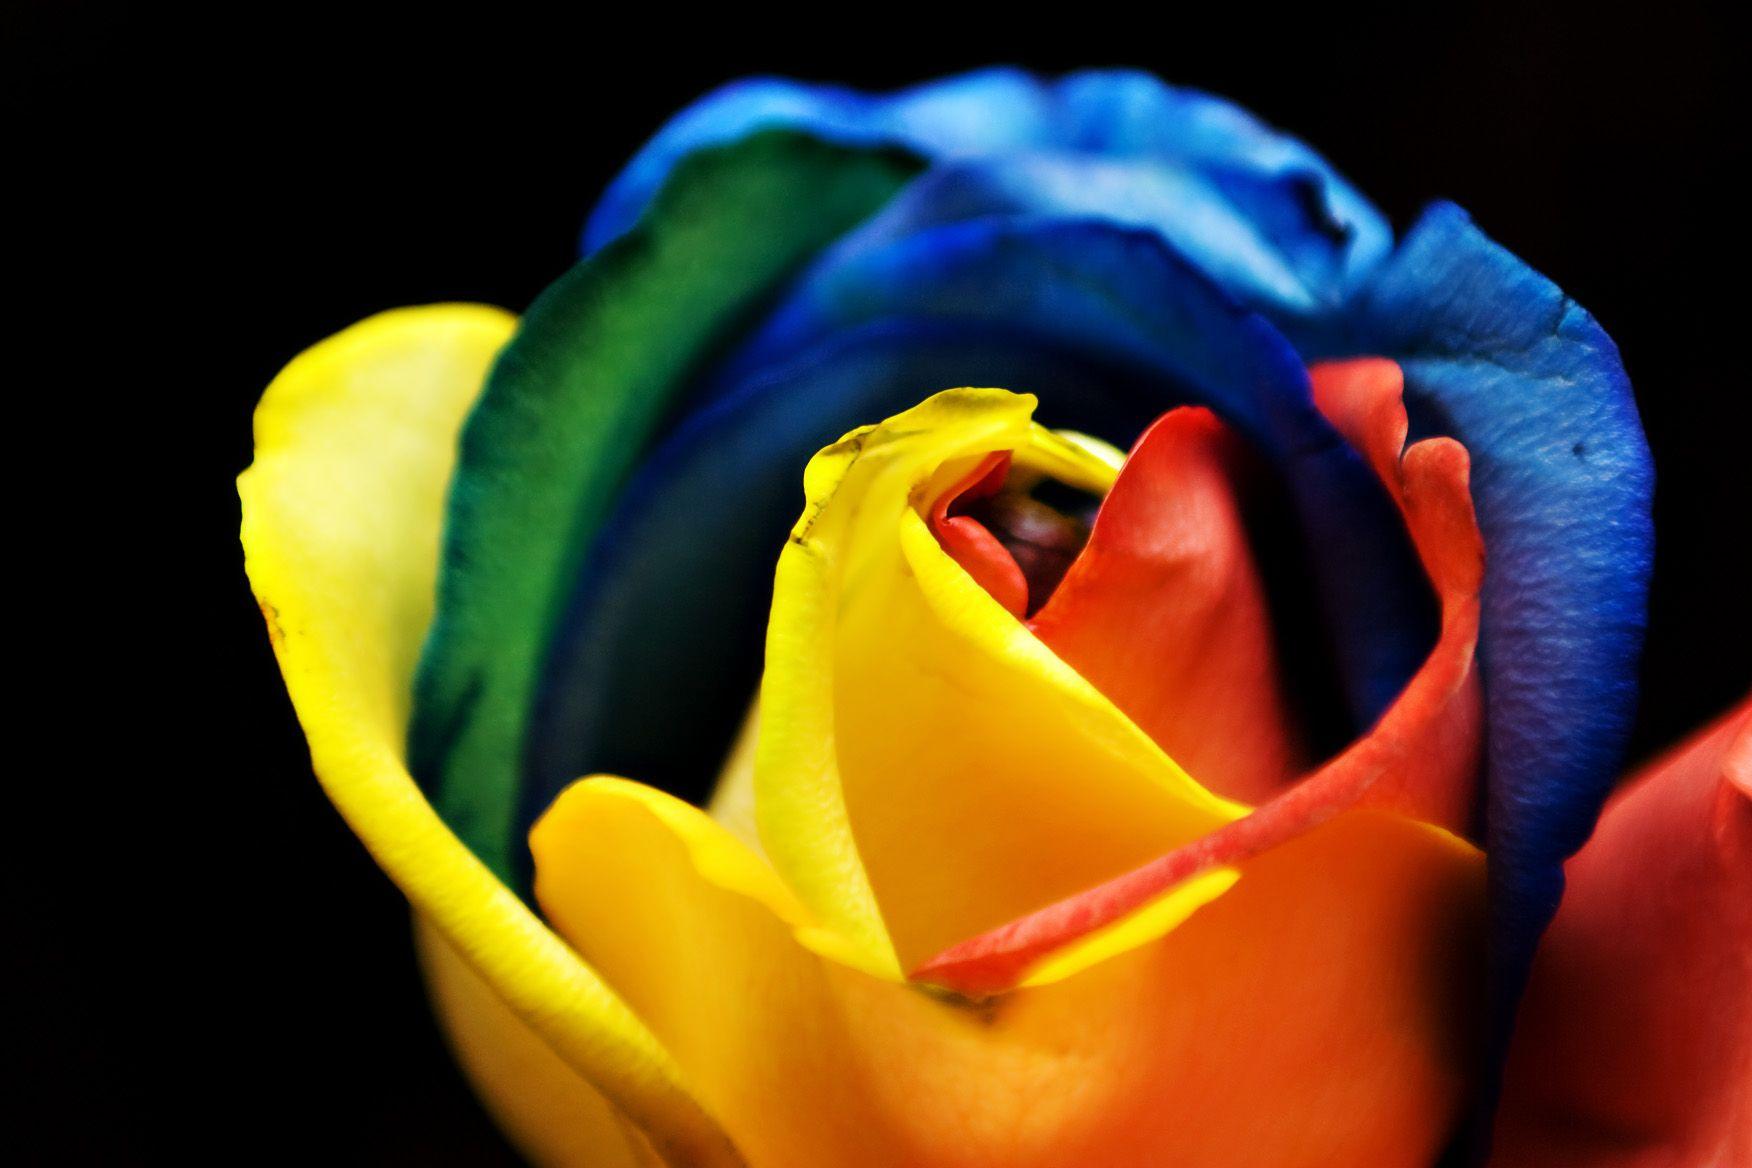 Neon Rainbow Roses Wallpaper